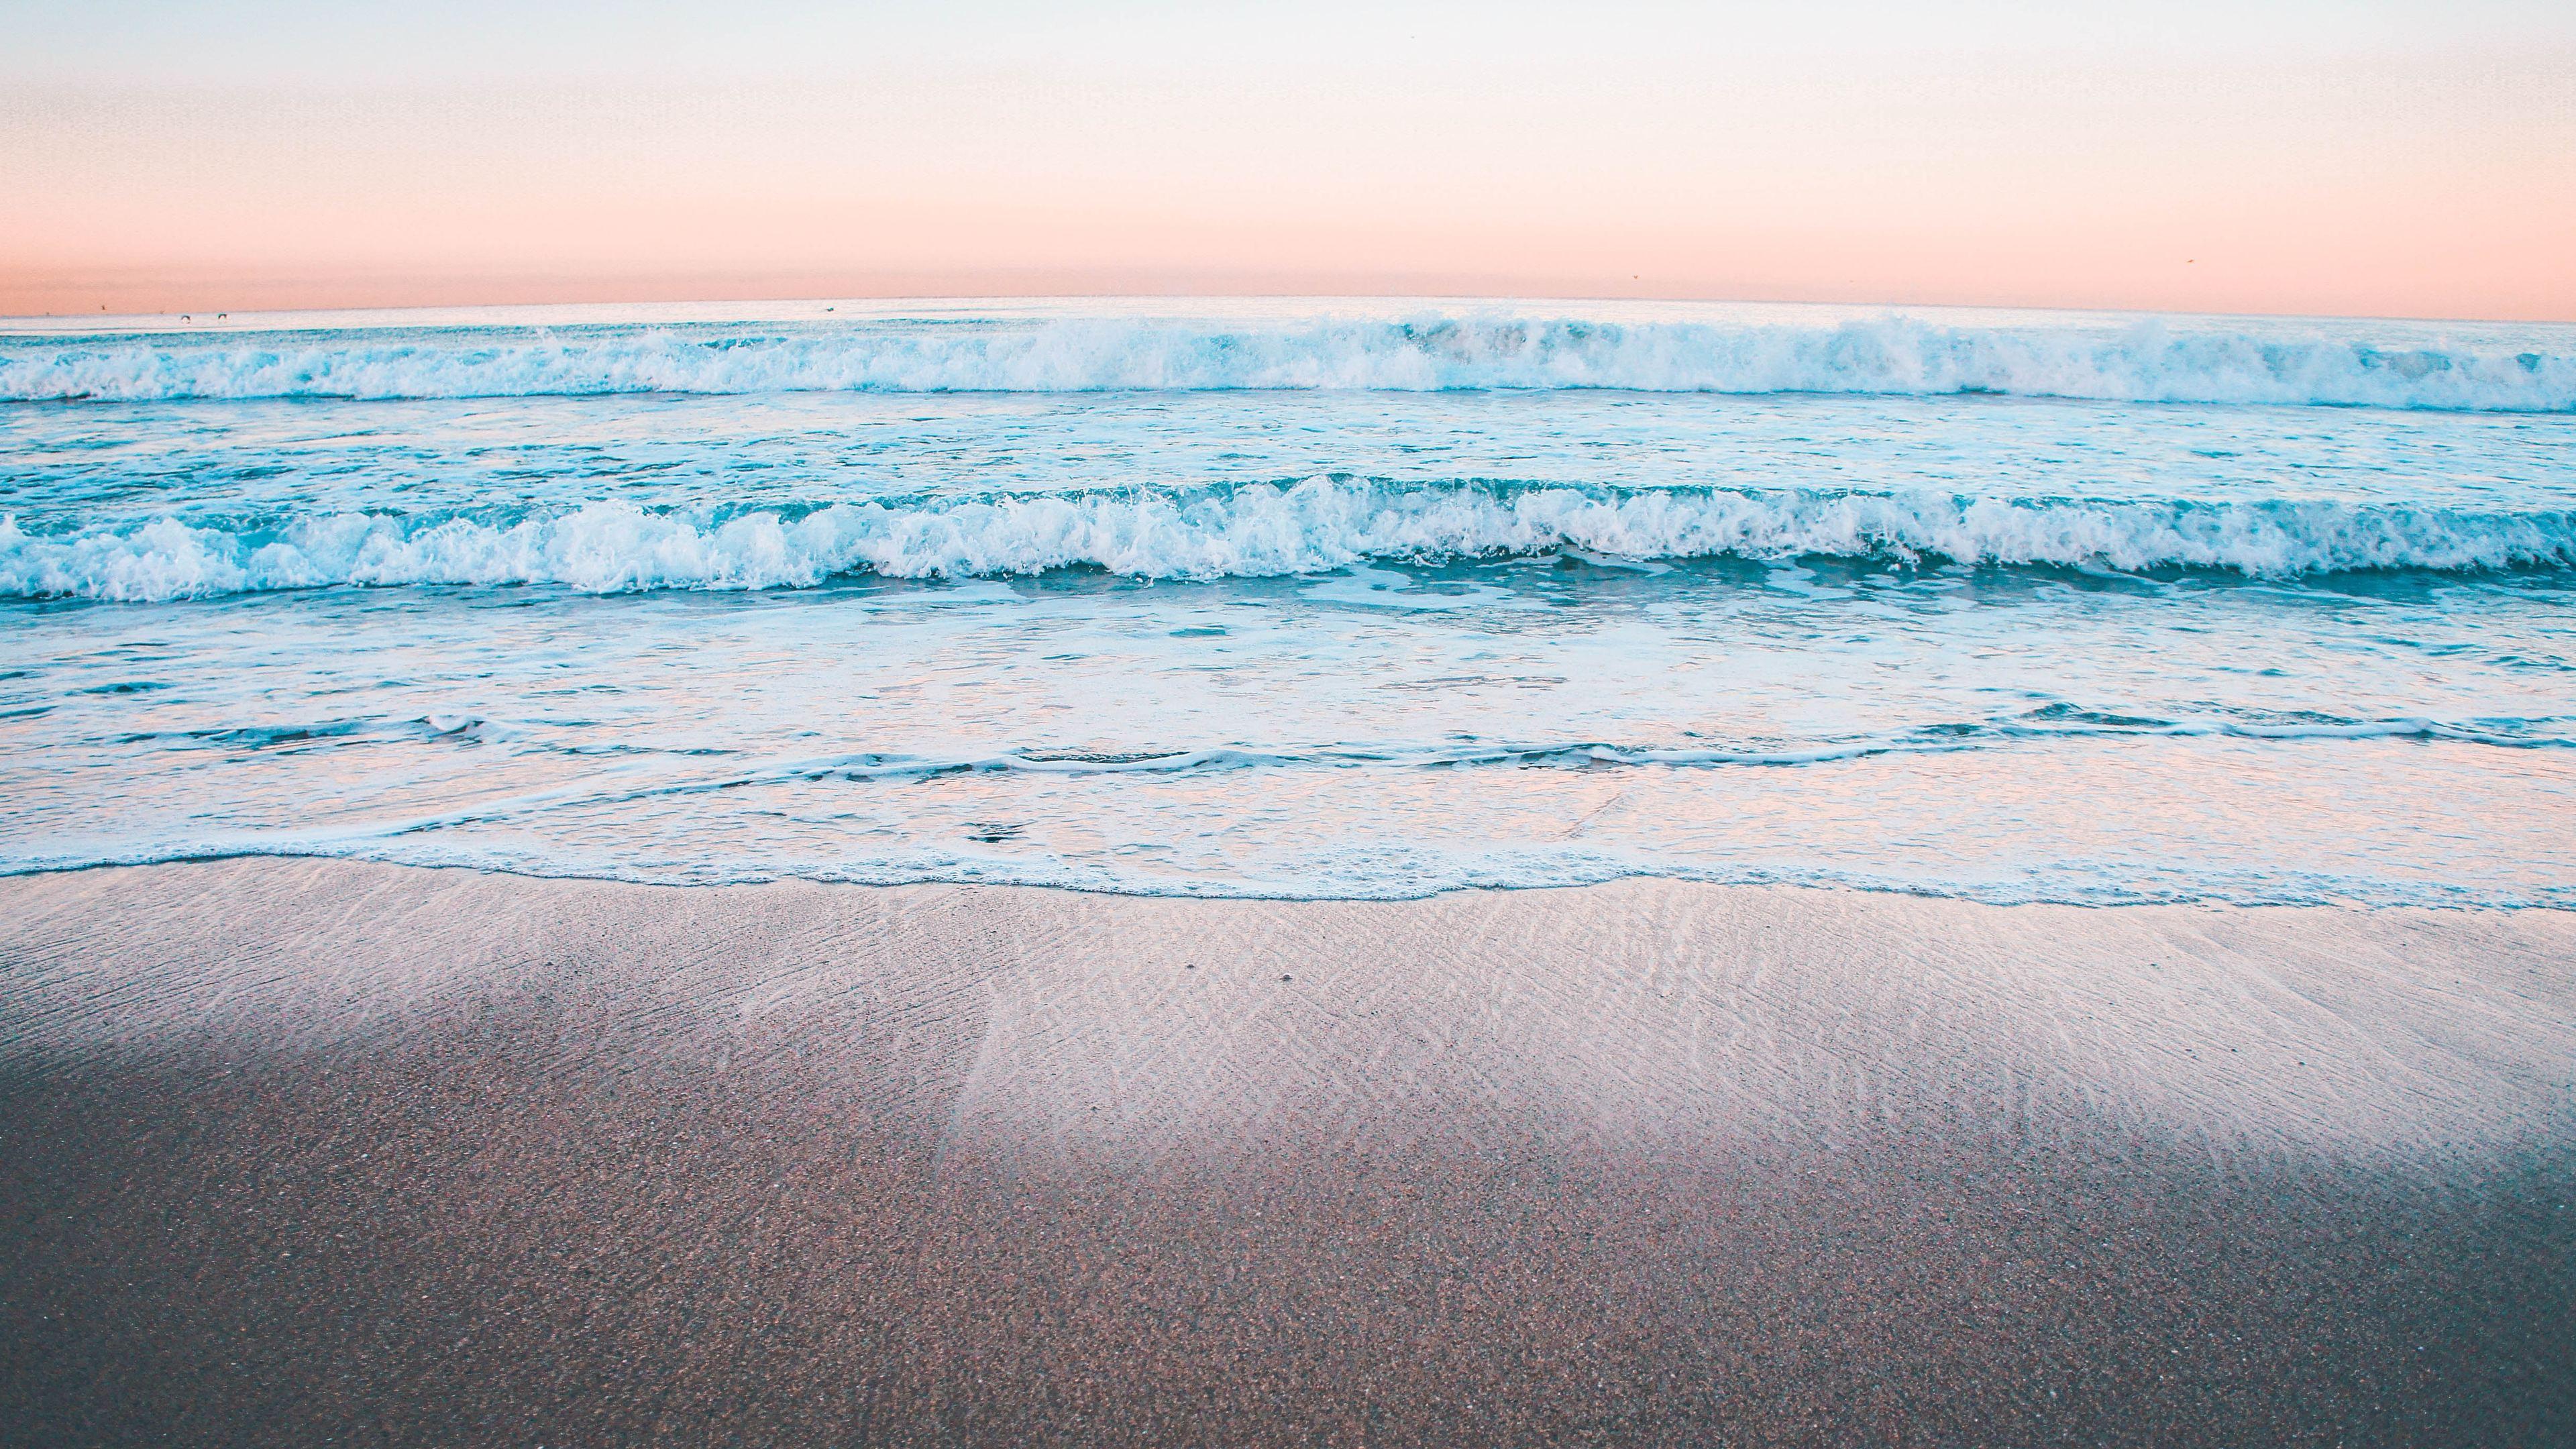 peaceful calm waves 4k 1540142336 - Peaceful Calm Waves 4k - waves wallpapers, nature wallpapers, hd-wallpapers, 5k wallpapers, 4k-wallpapers